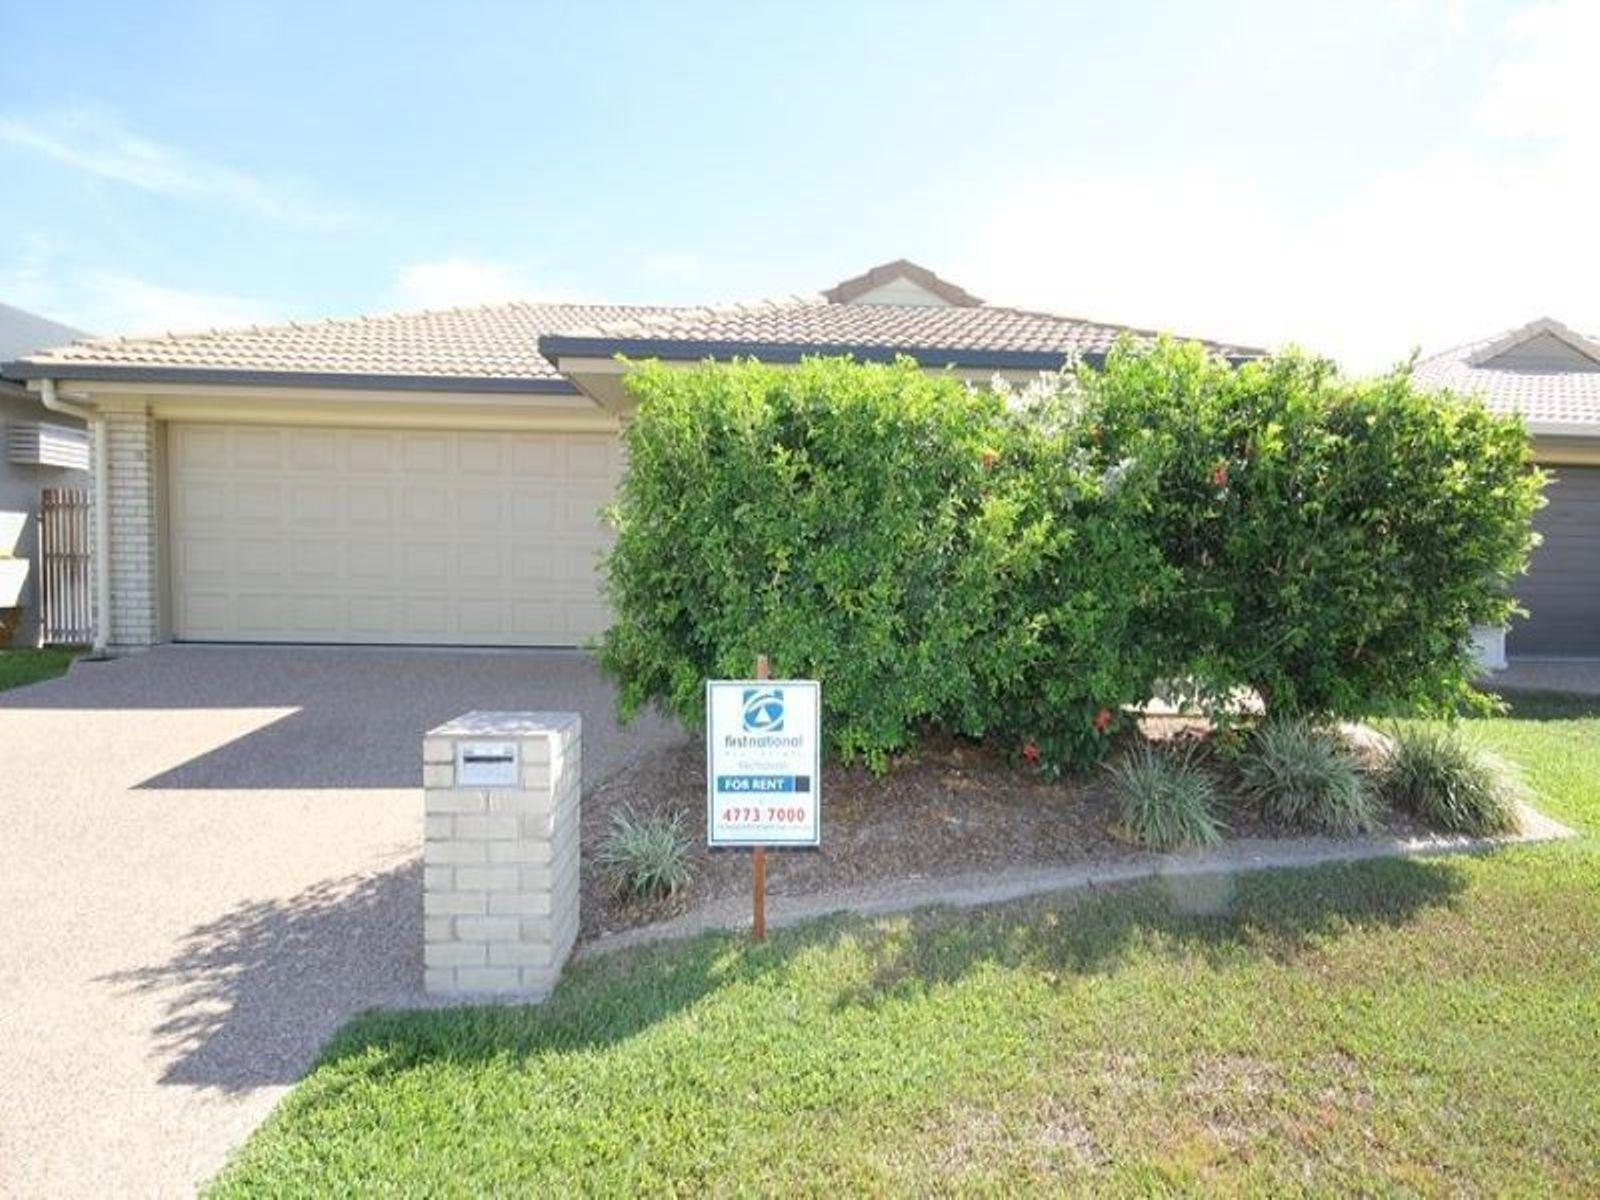 16 Coomera Curcuit, Bohle Plains, QLD 4817